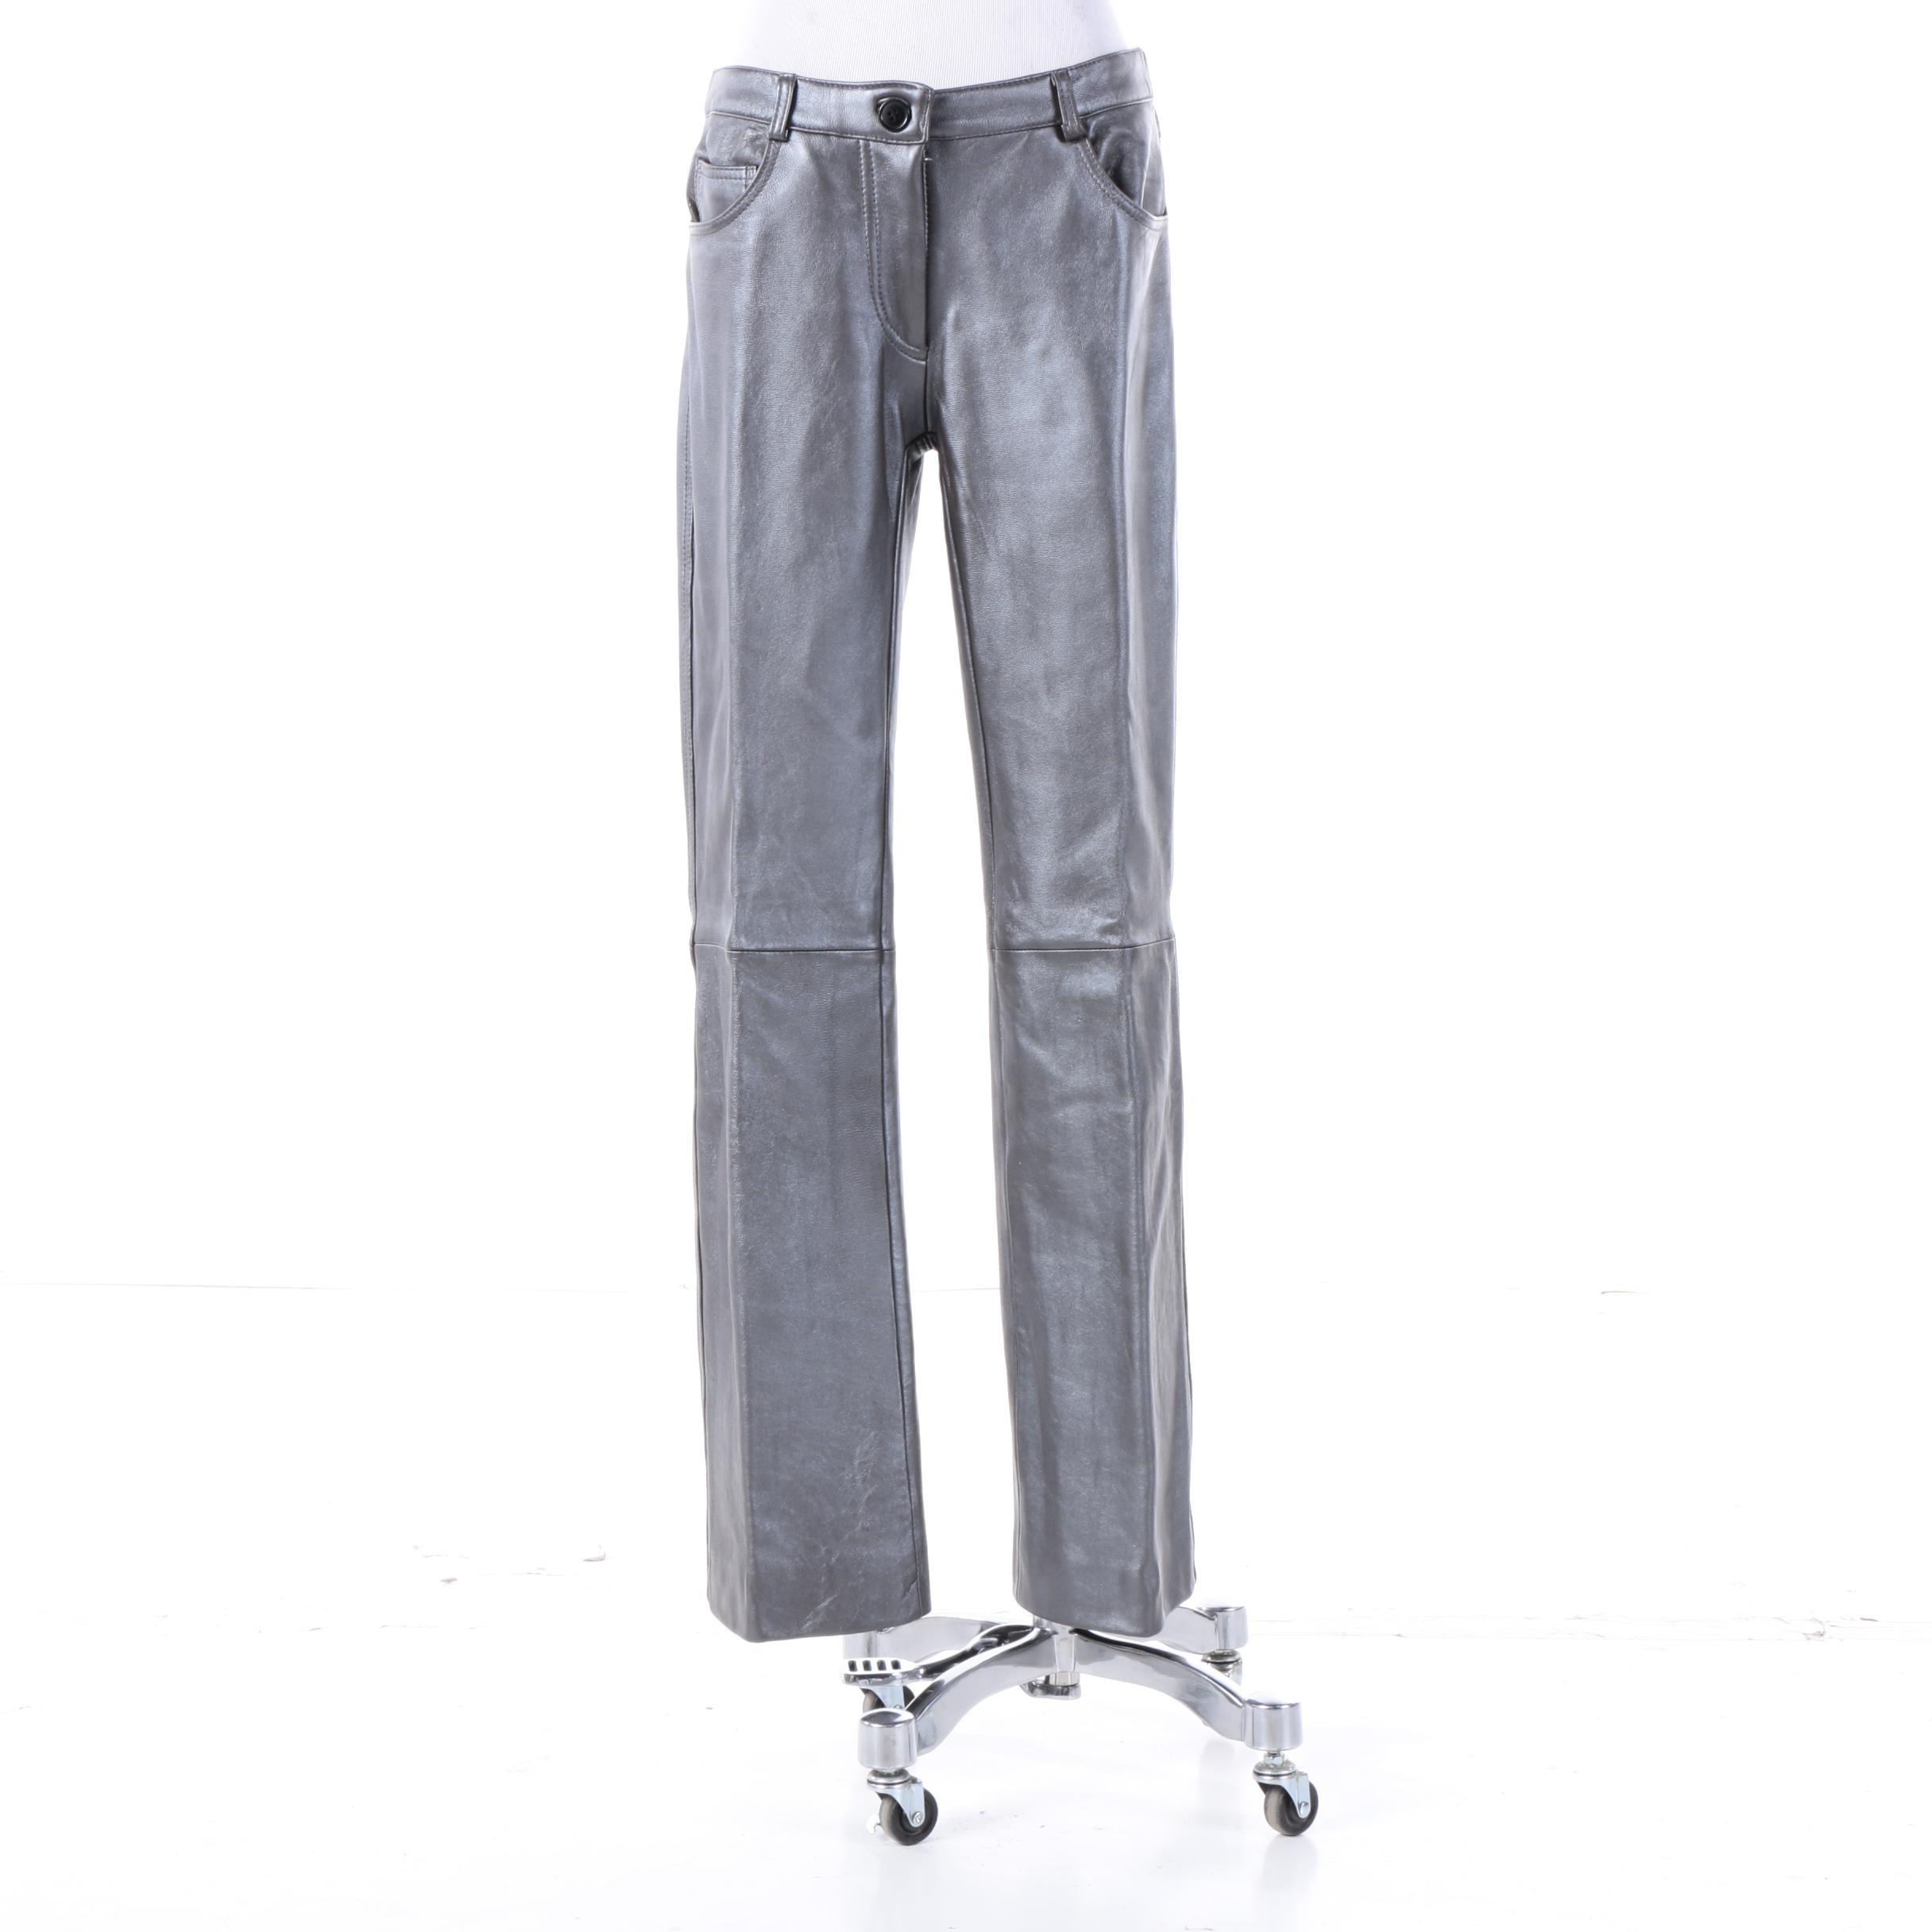 Sutton Studio Silver Tone Lambskin Leather Pants